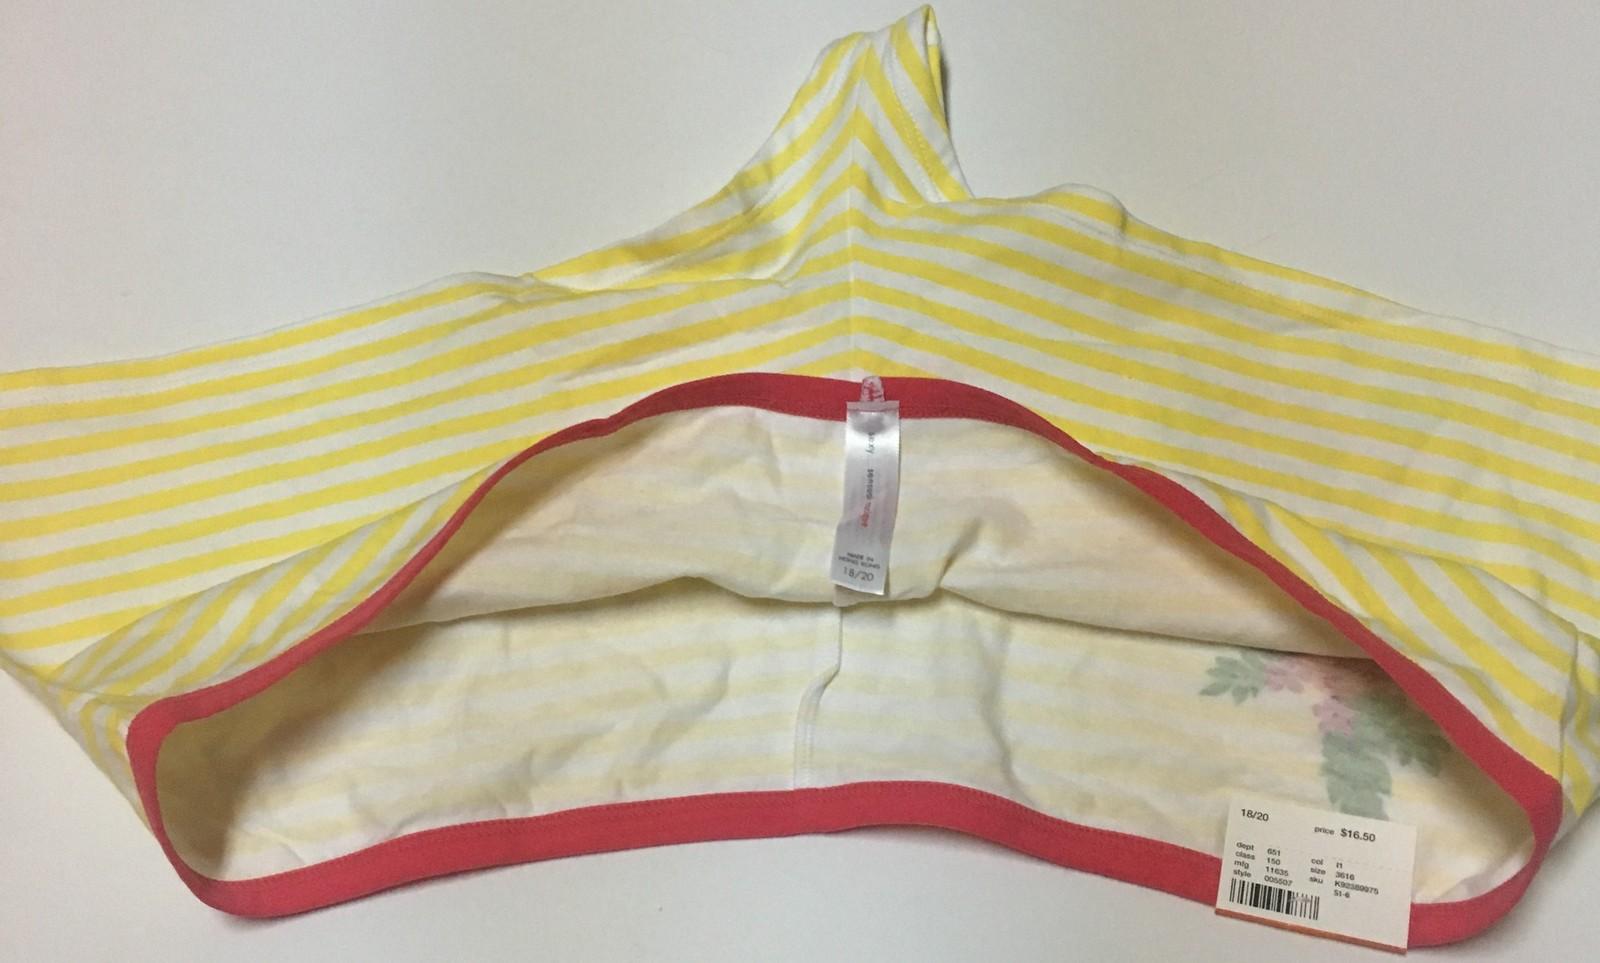 Cacique Women's Boy Short Underwear Panties Sz 18/20